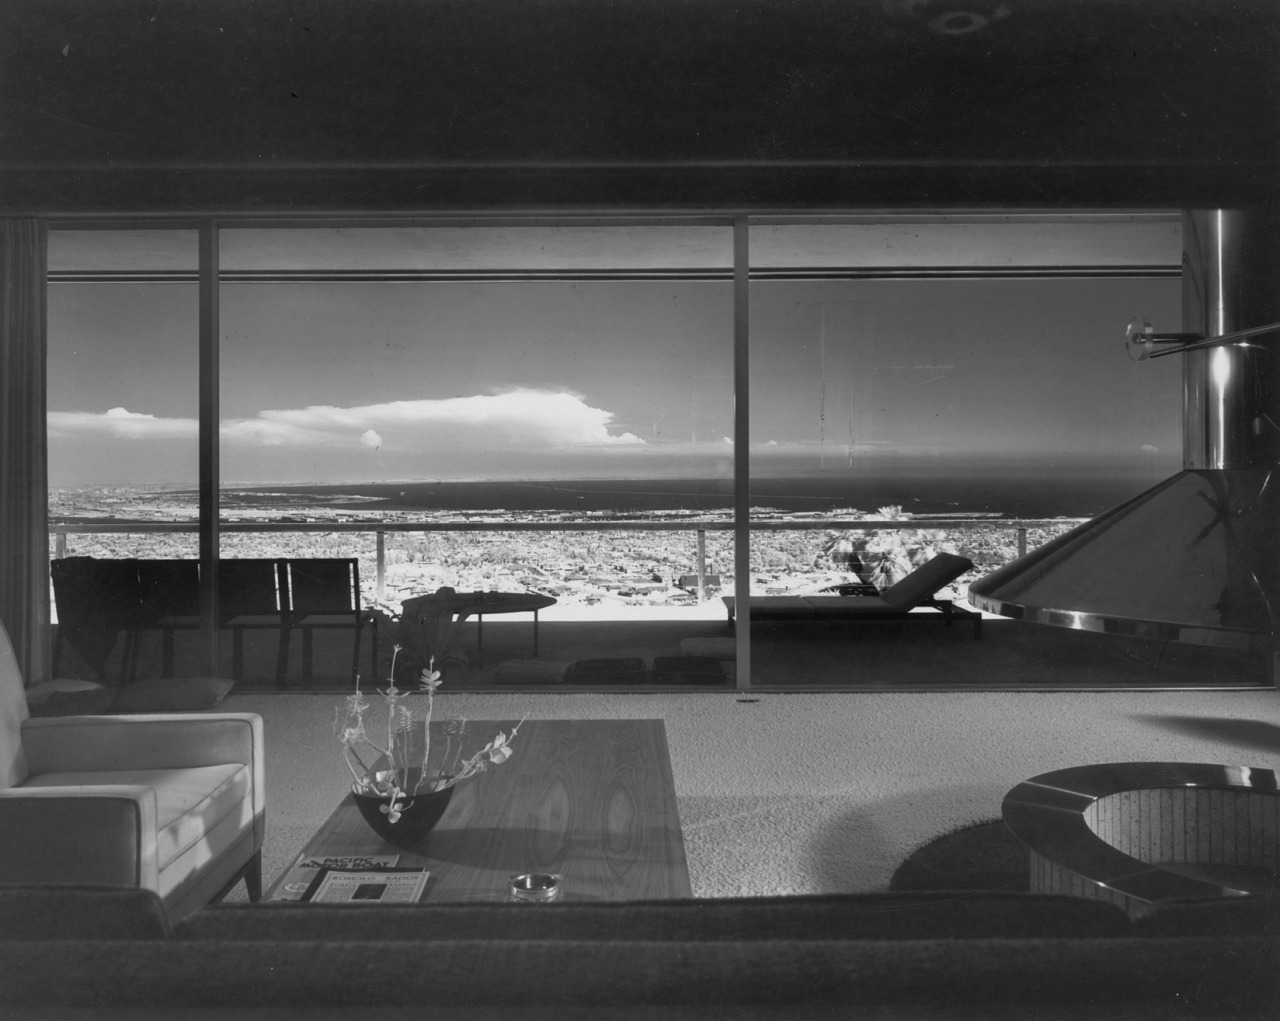 jonasgrossmann:richard neutra… rados house, los angeles 1958/1968photos by julius shulman@ primo